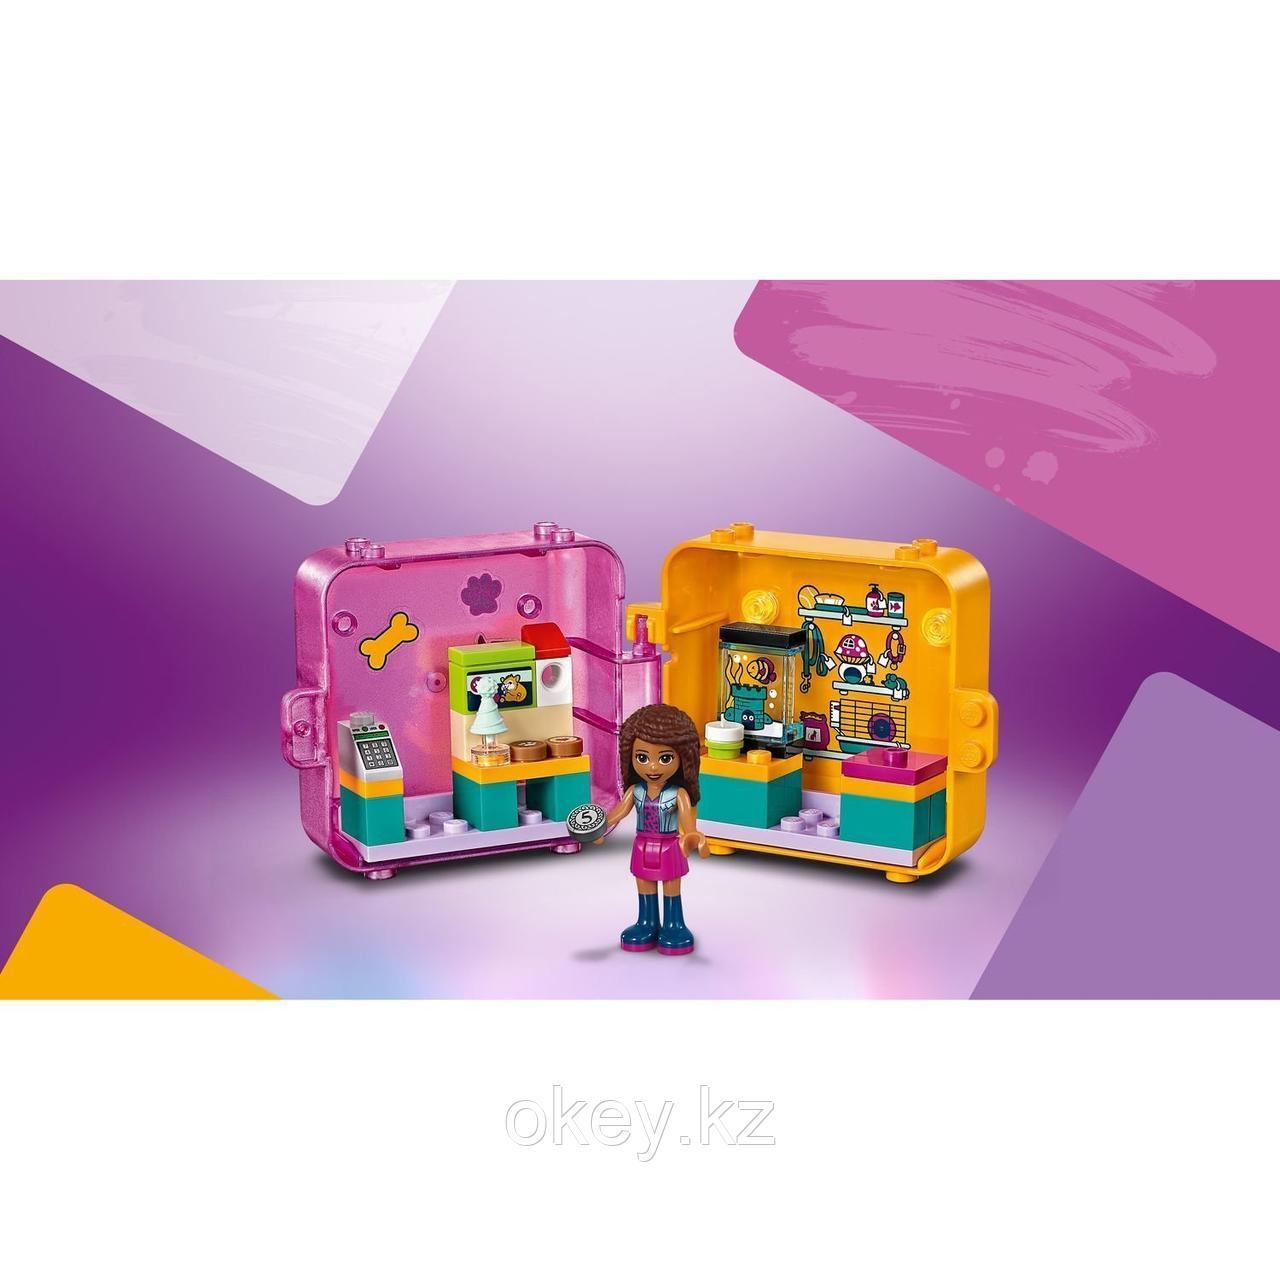 LEGO Friends: Игровая шкатулка Покупки Андреа 41405 - фото 9